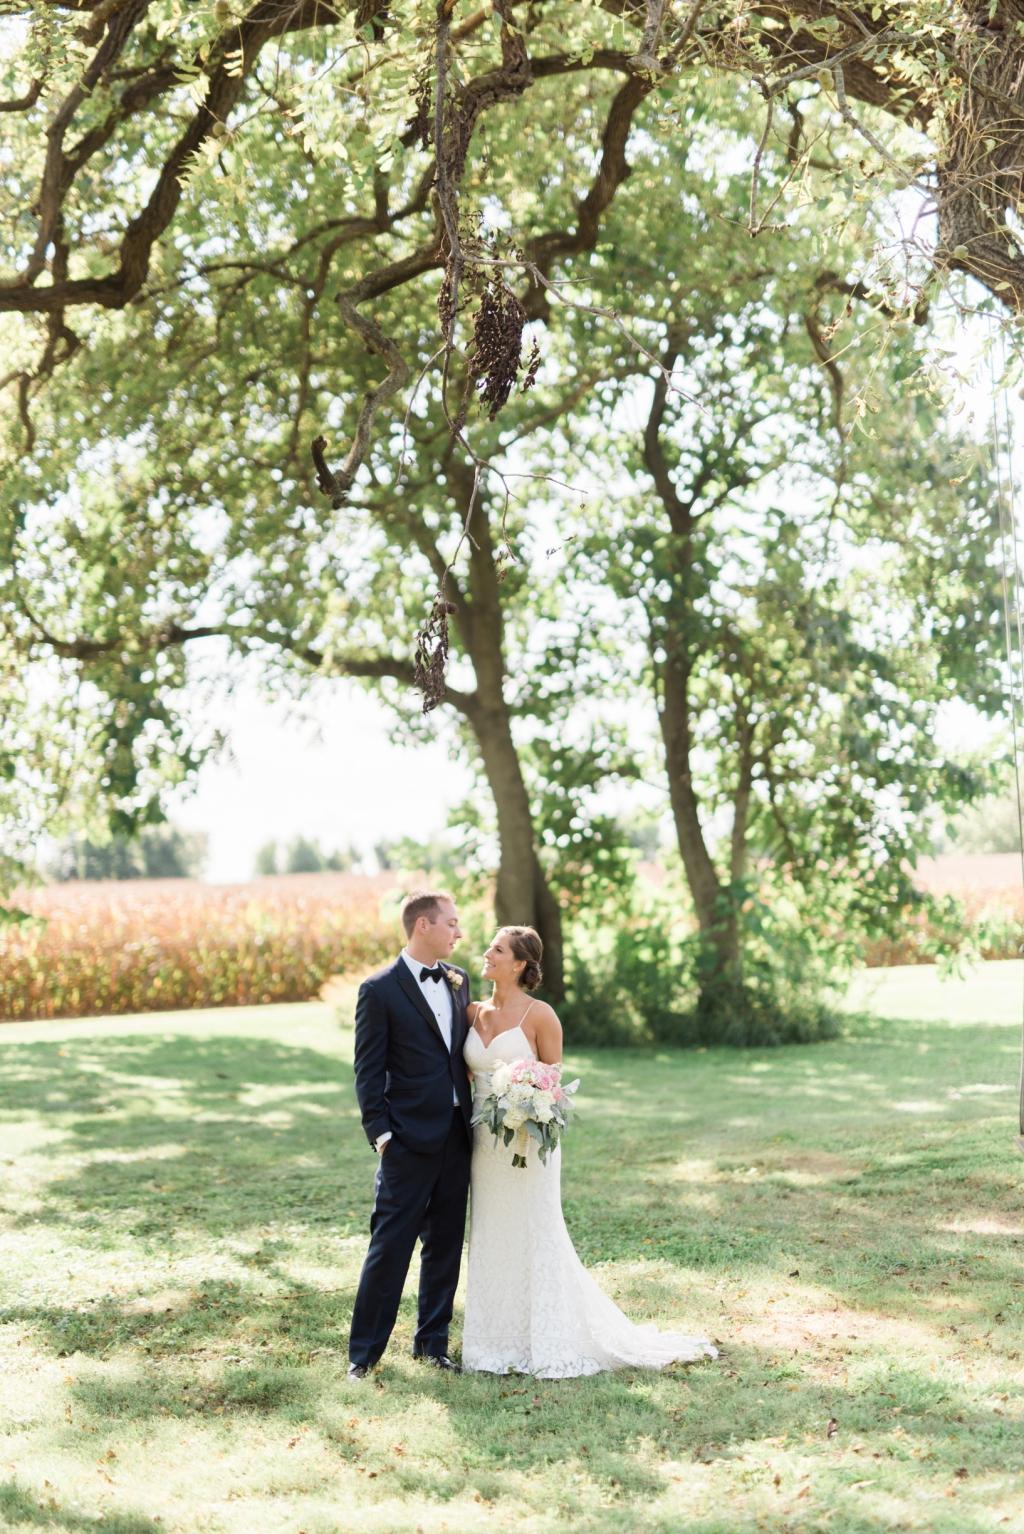 haley-richter-photography-buena-vista-confrence-center-wedding-summer-073